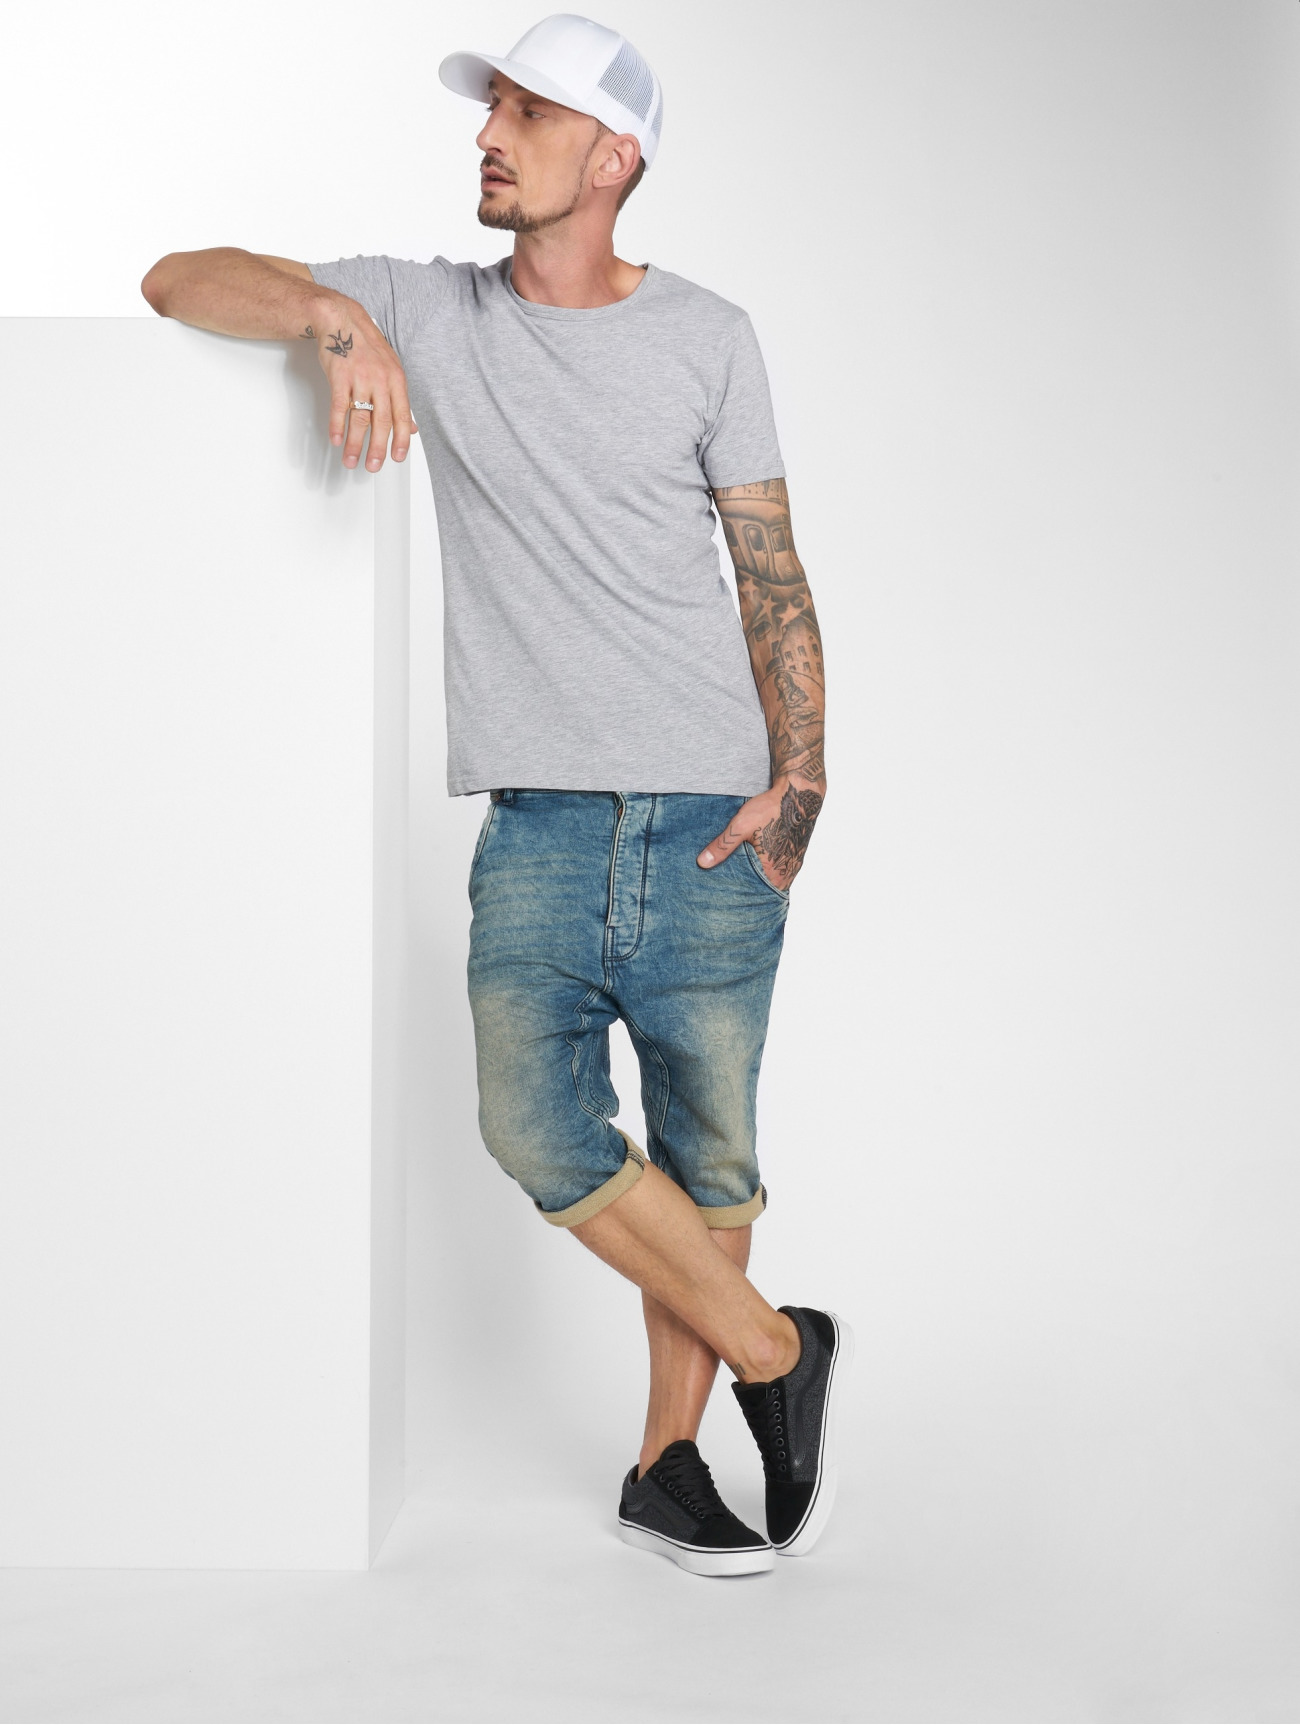 VSCT Clubwear  Noel  bleu Homme Short  531882 Homme Pantalons & Shorts